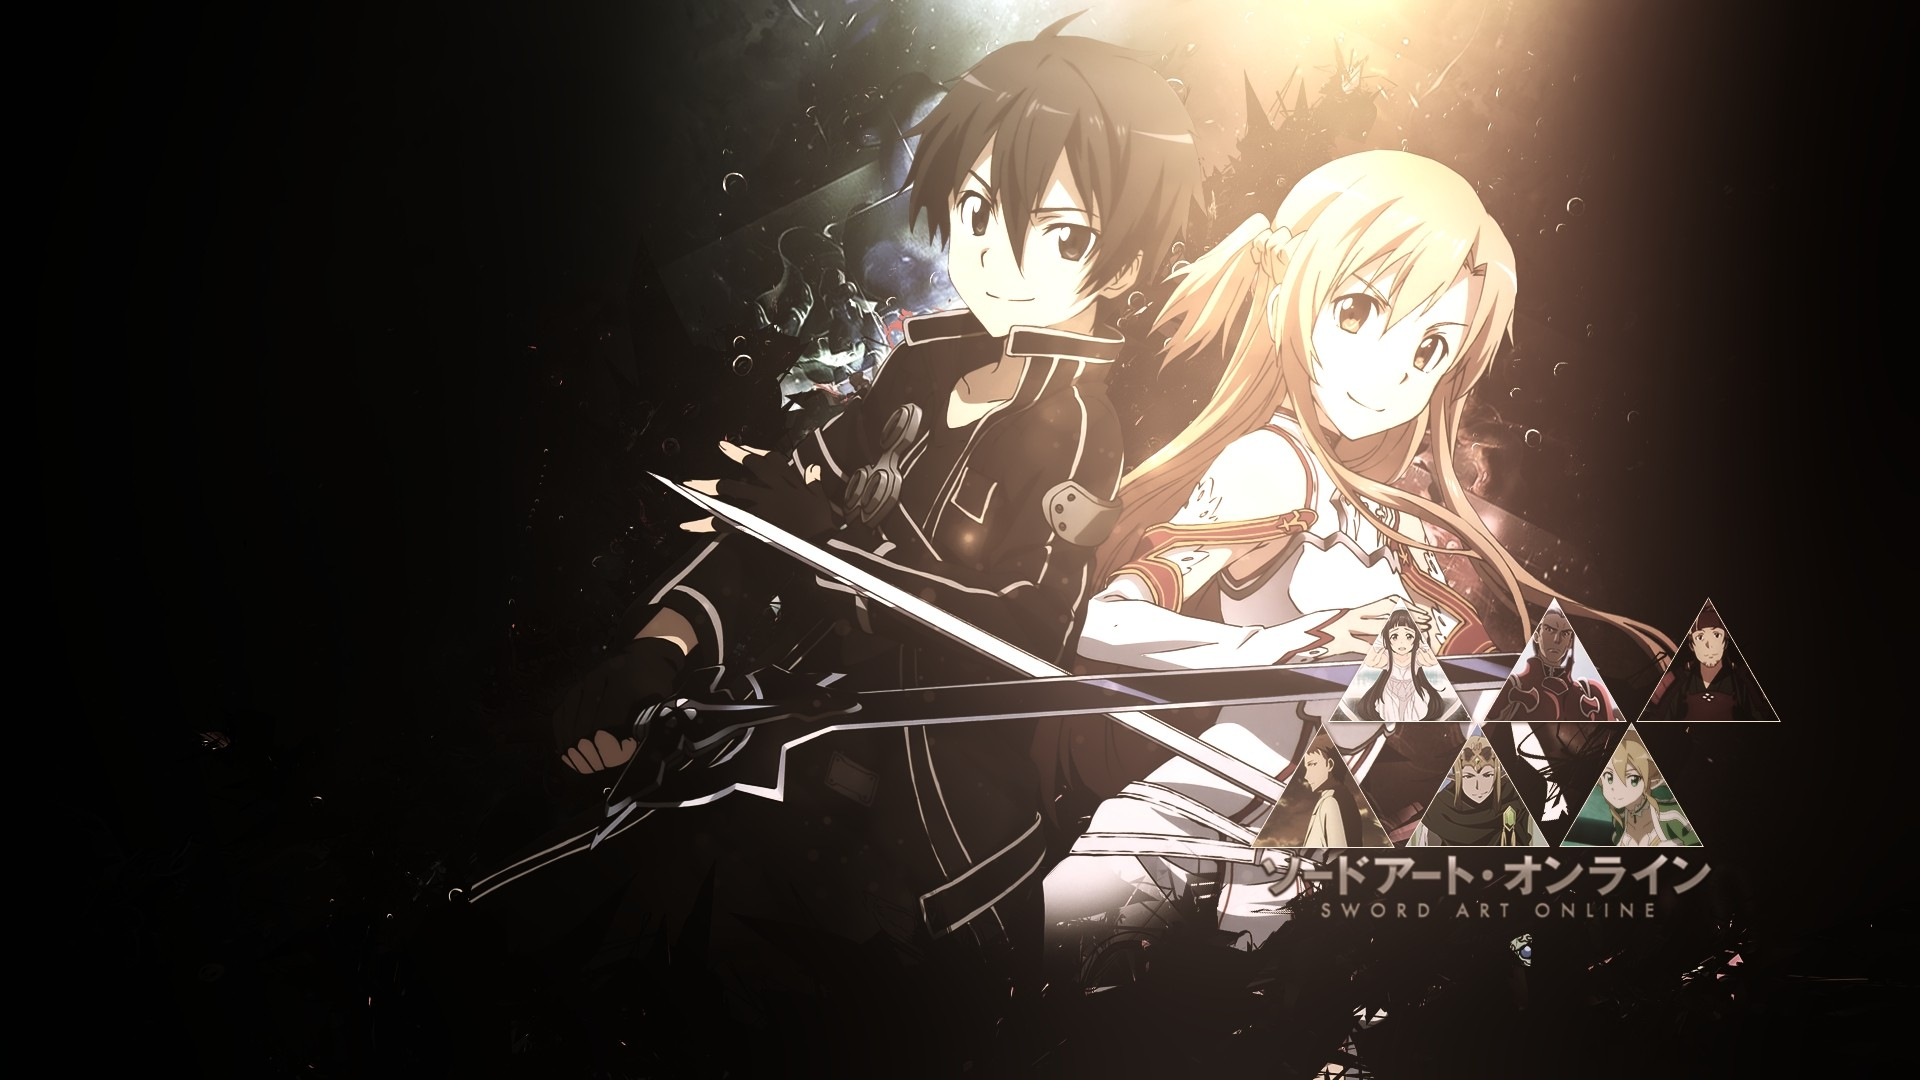 Sword Art line background ·â' Download free beautiful High